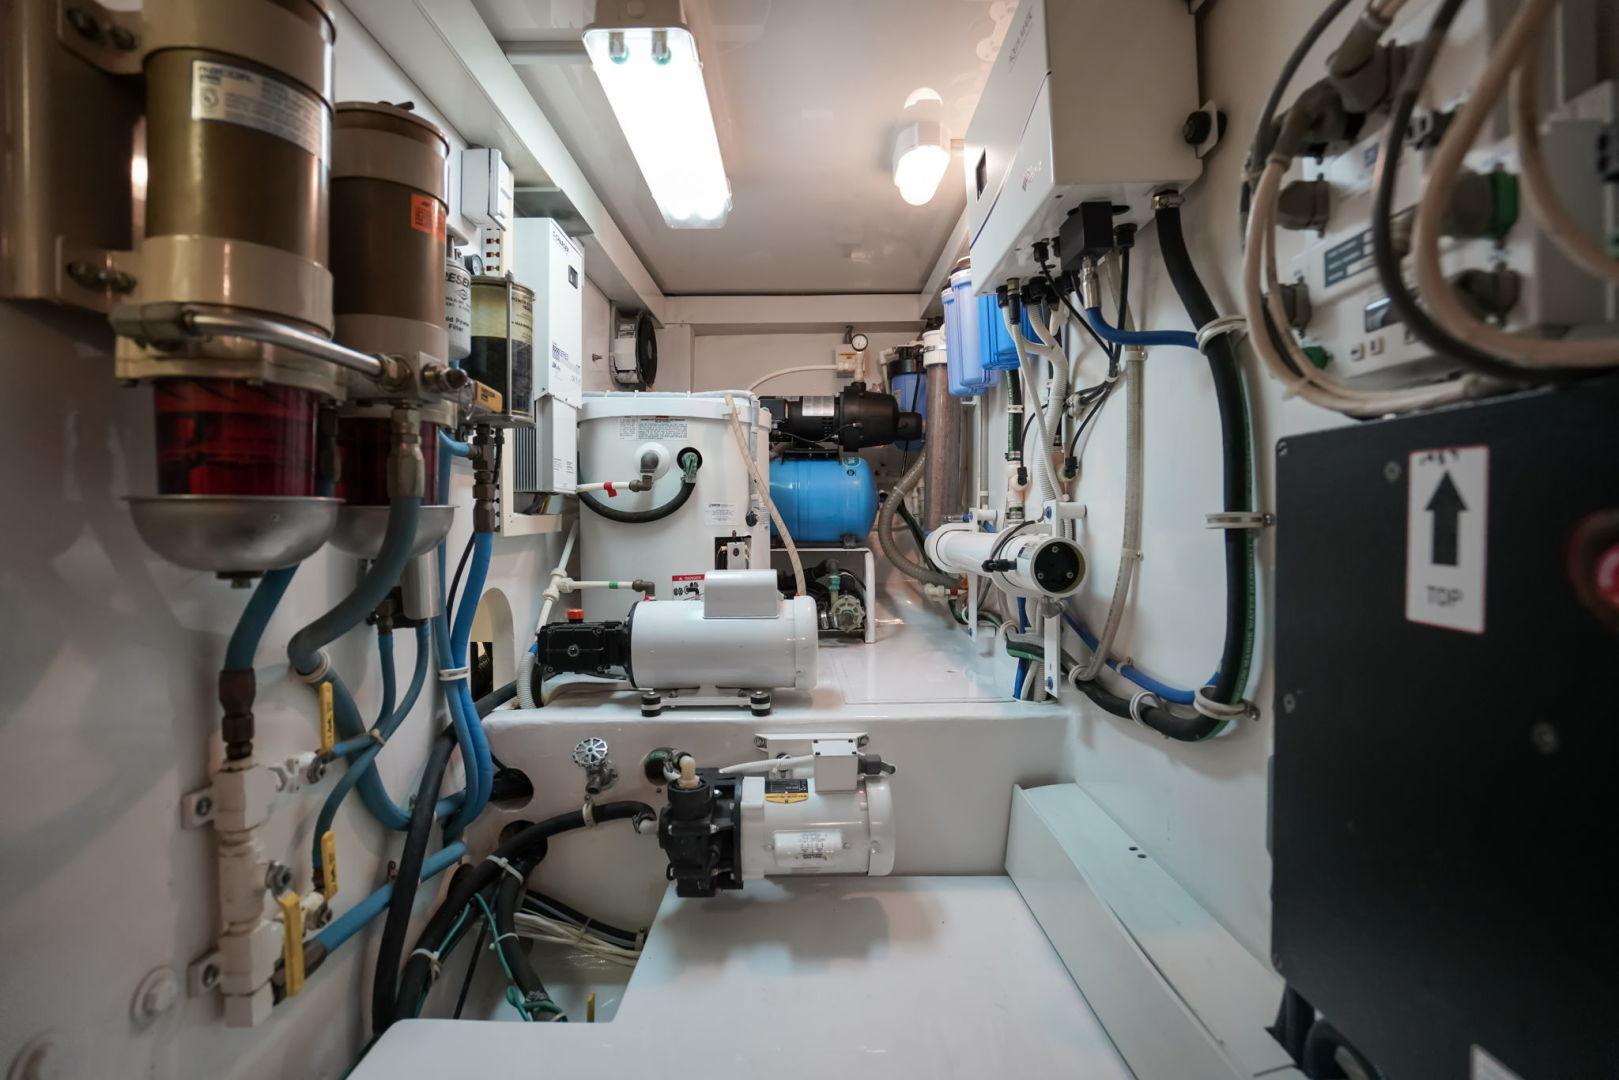 Viking-Convertible 2002-Blue Eyes North Palm Beach-Florida-United States-Engine Room-1490407   Thumbnail